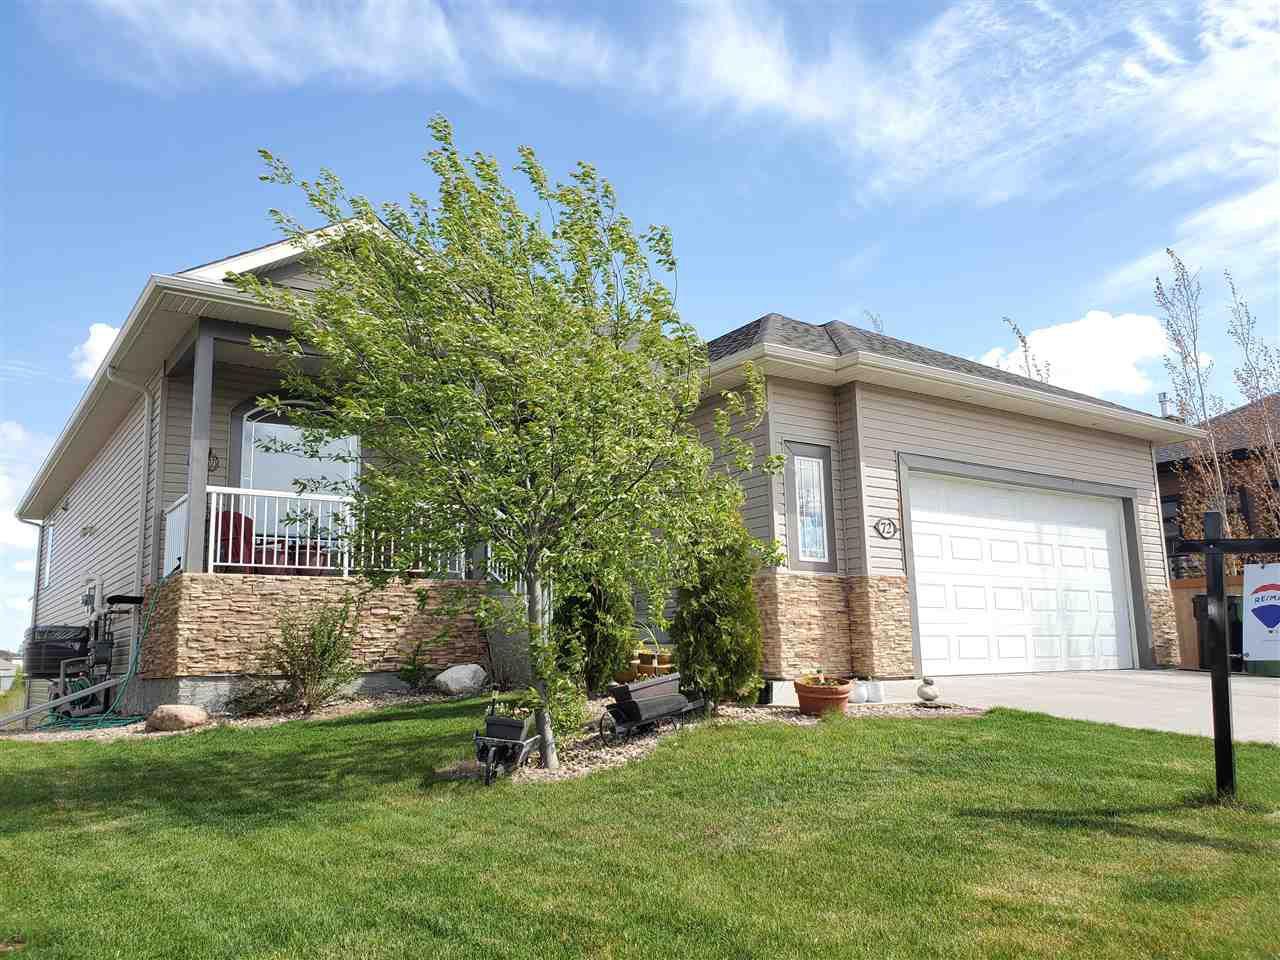 Photo 1: Photos: 72 WALTERS Place: Leduc House for sale : MLS®# E4143569